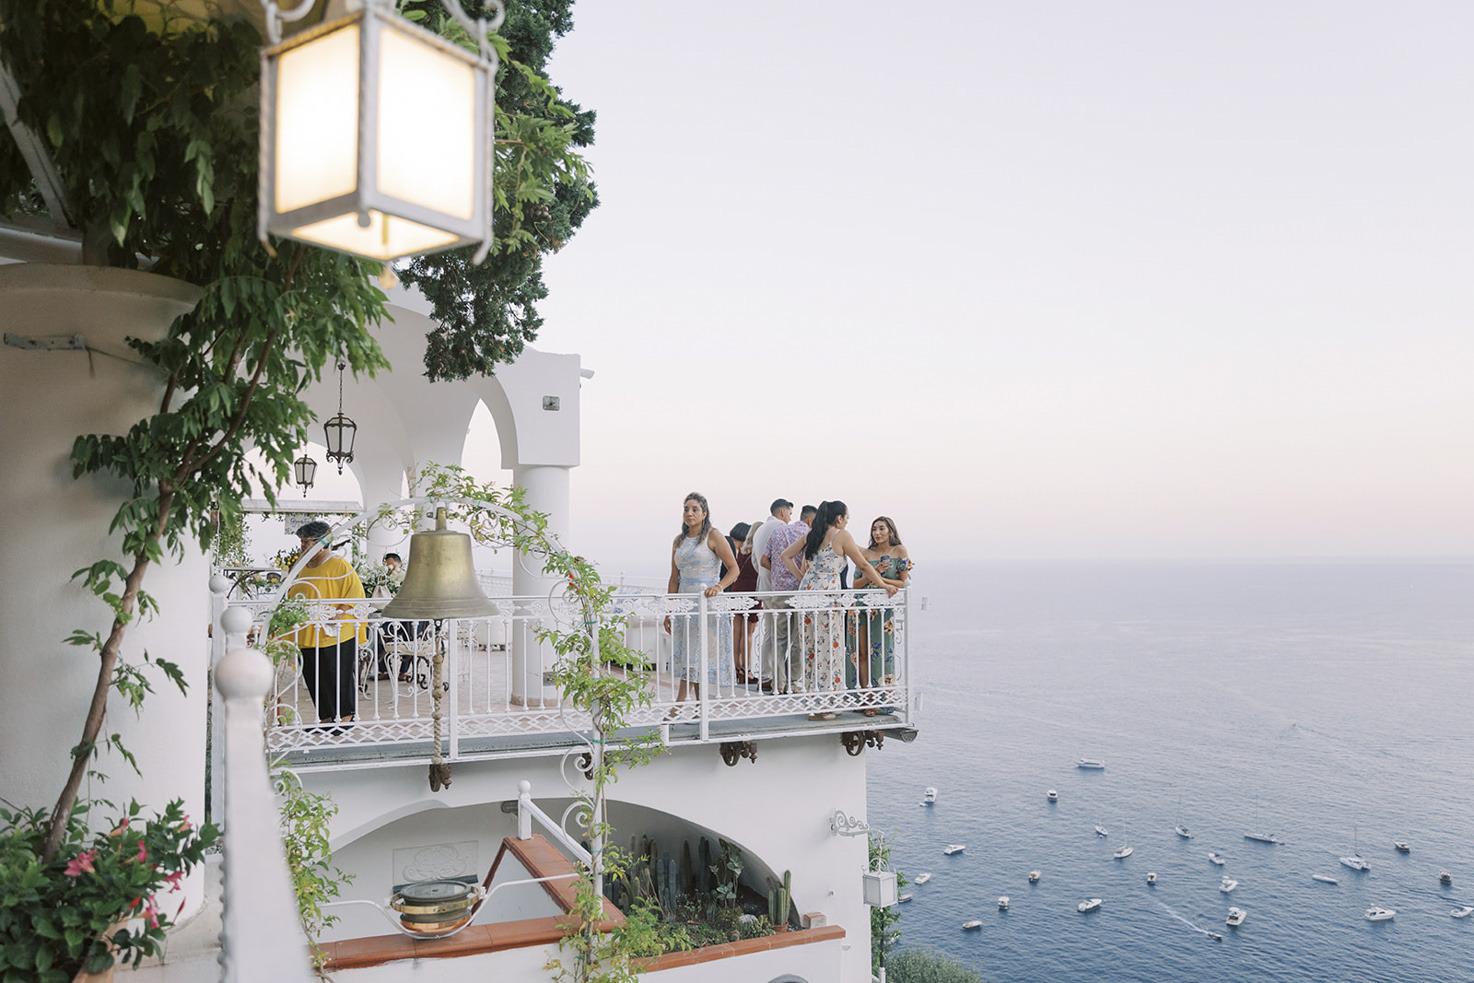 Sea view from Villa Oliviero